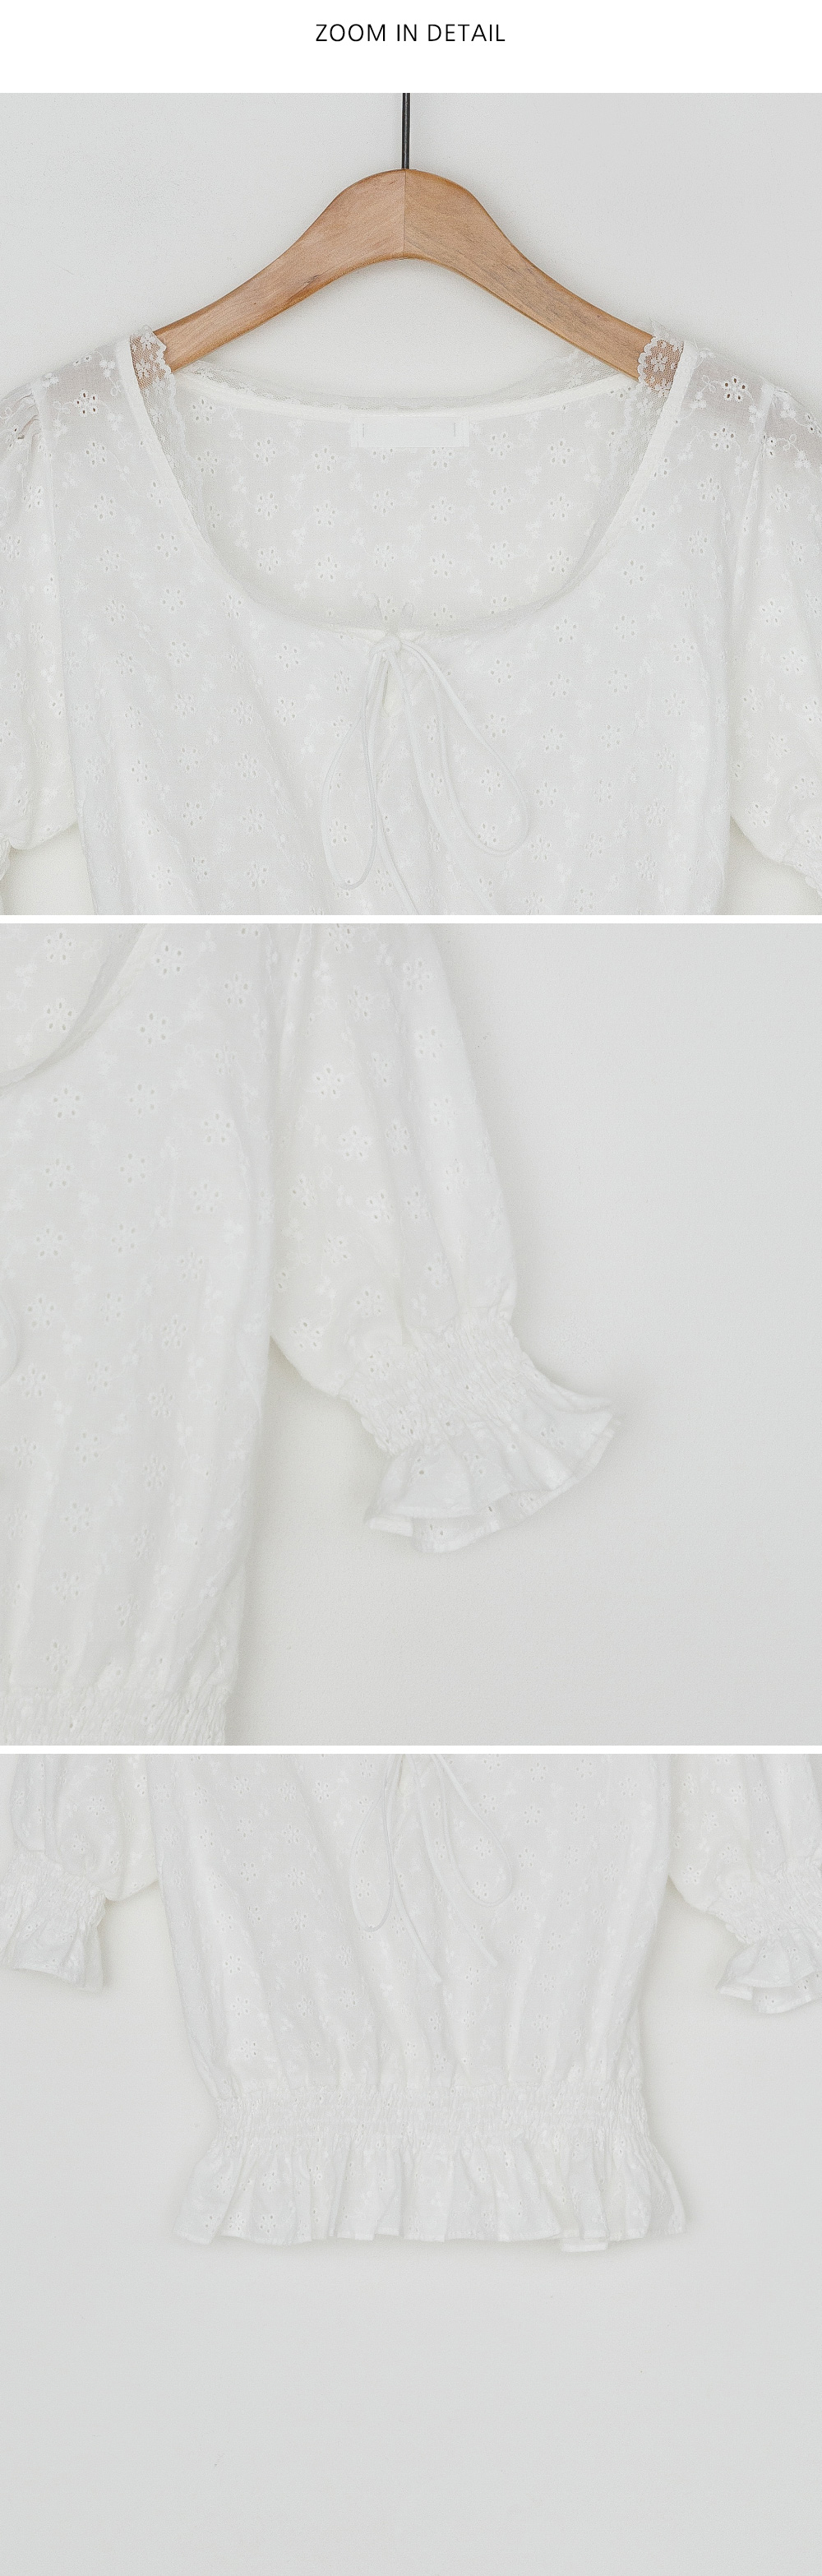 Punching lace shirring banding blouse